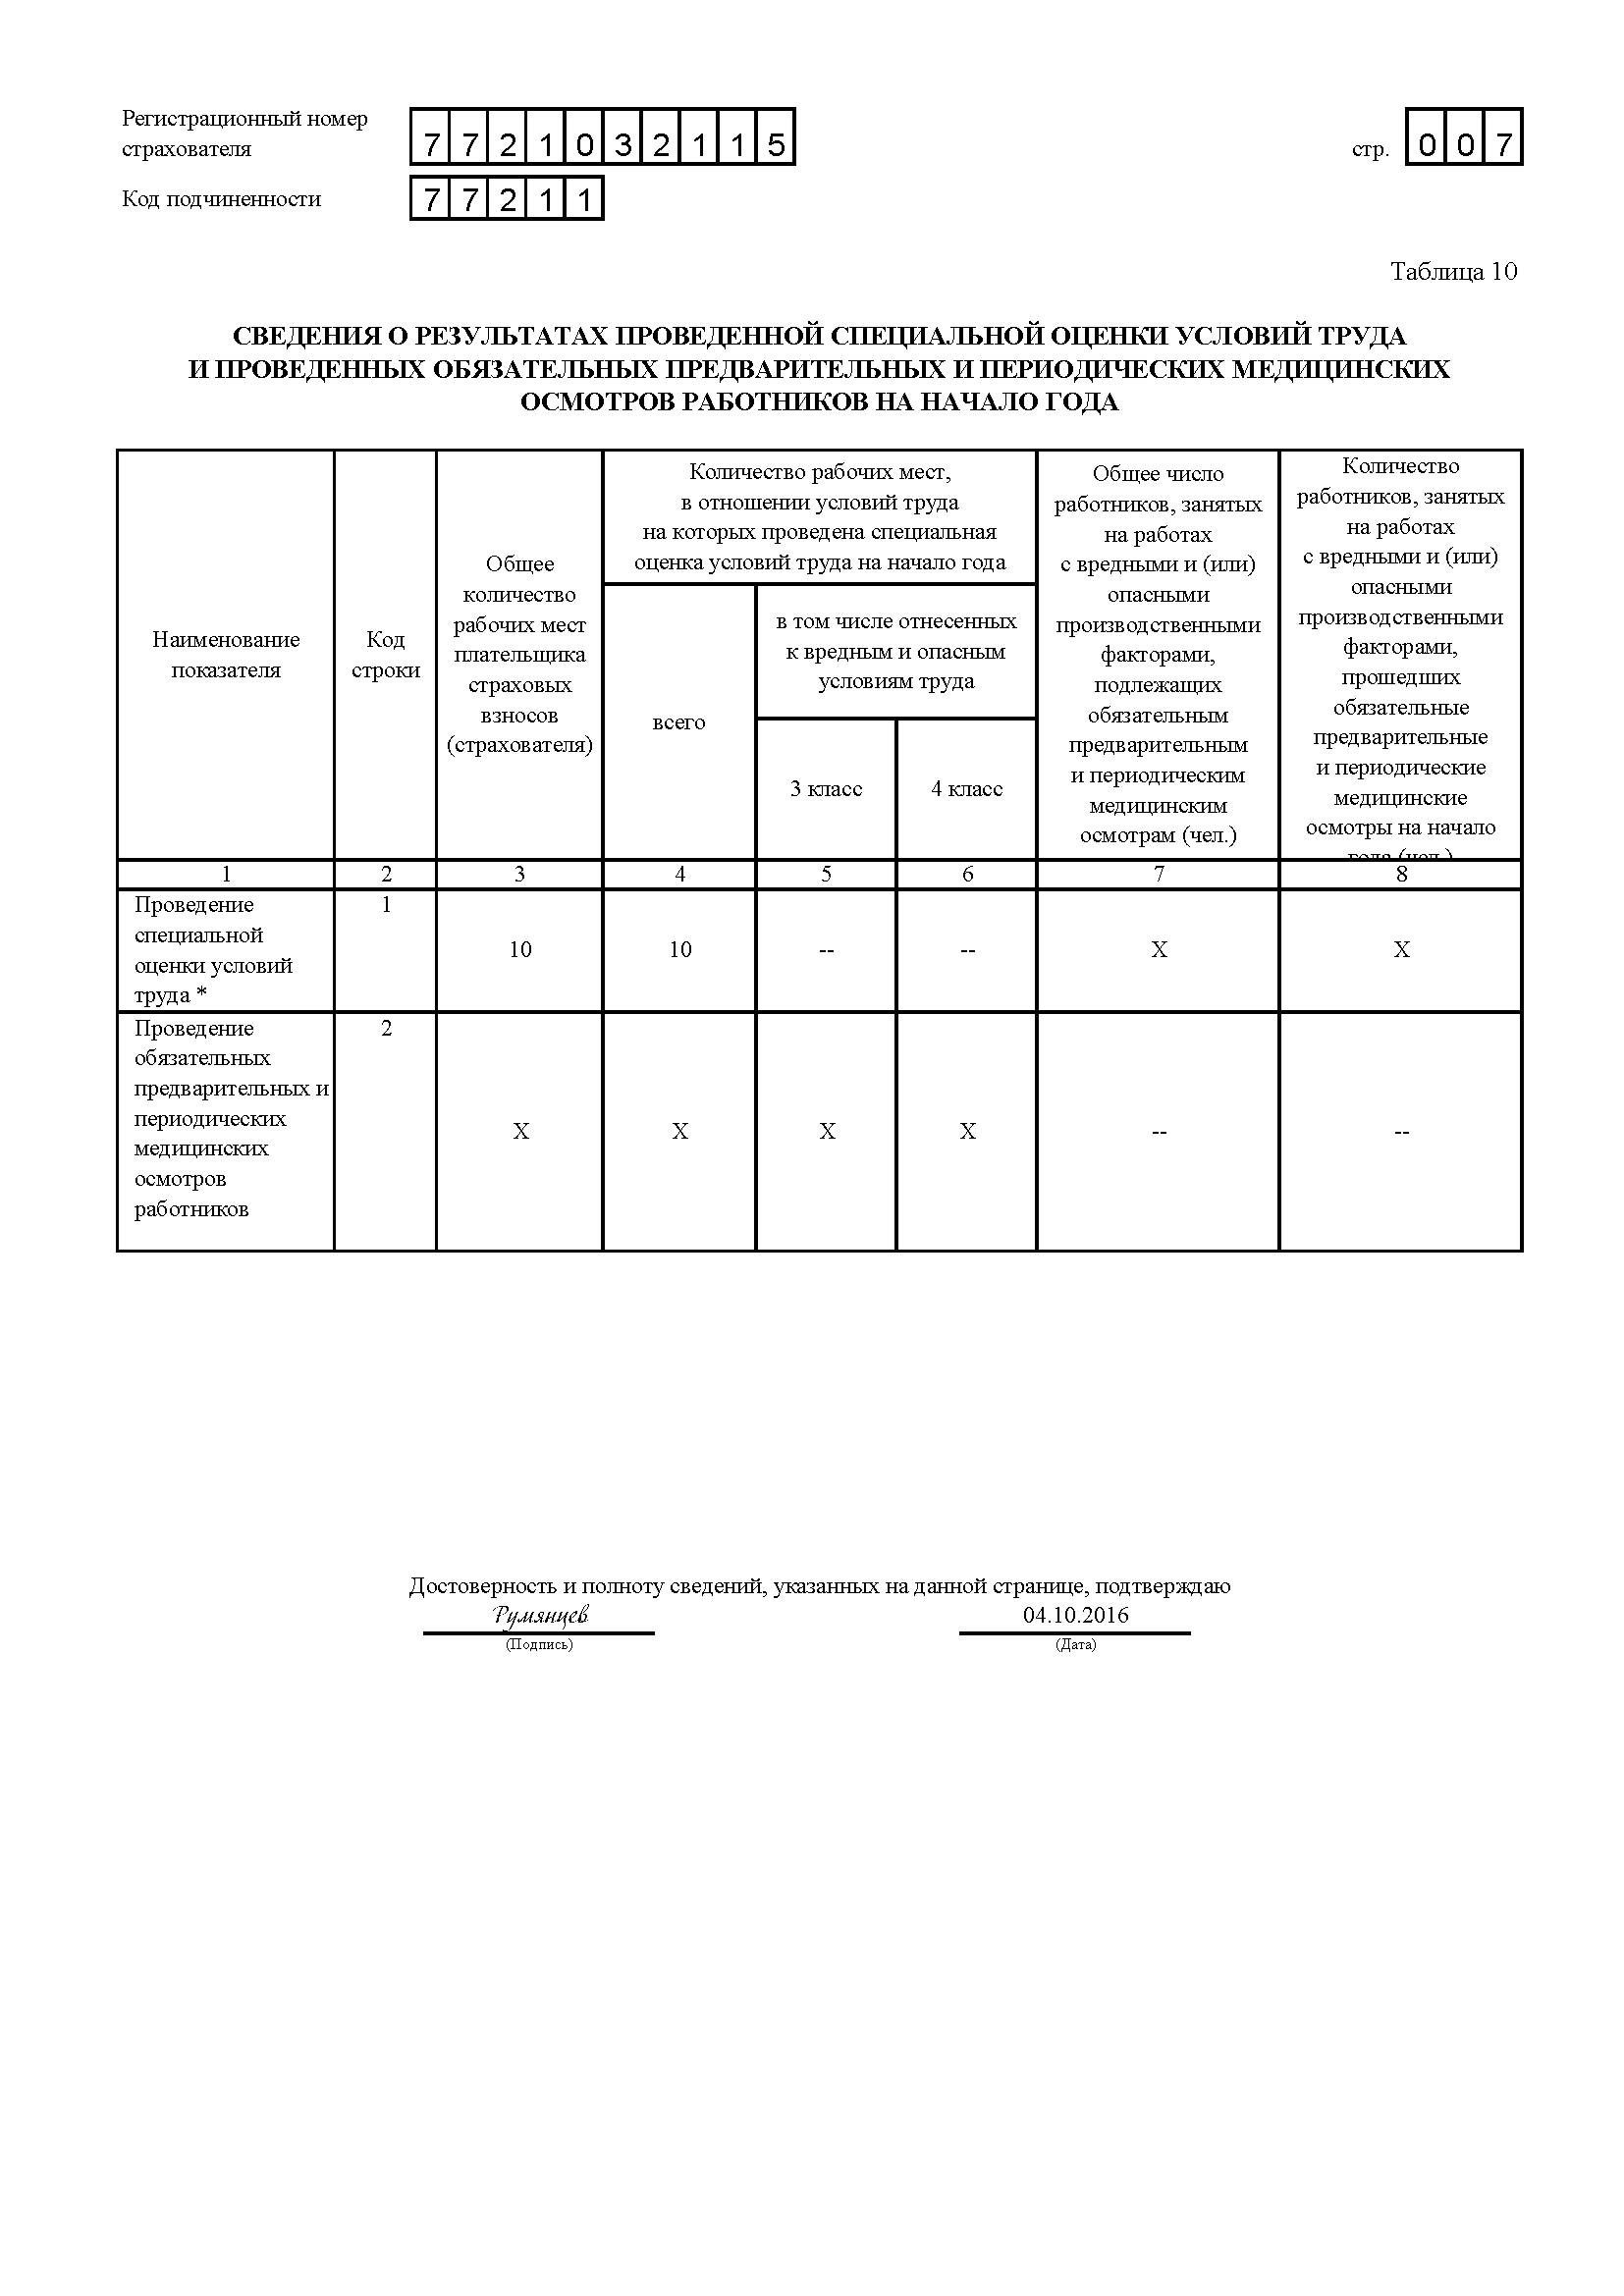 Образец заполнения 4 ФСС за 3 квартал 2016 года